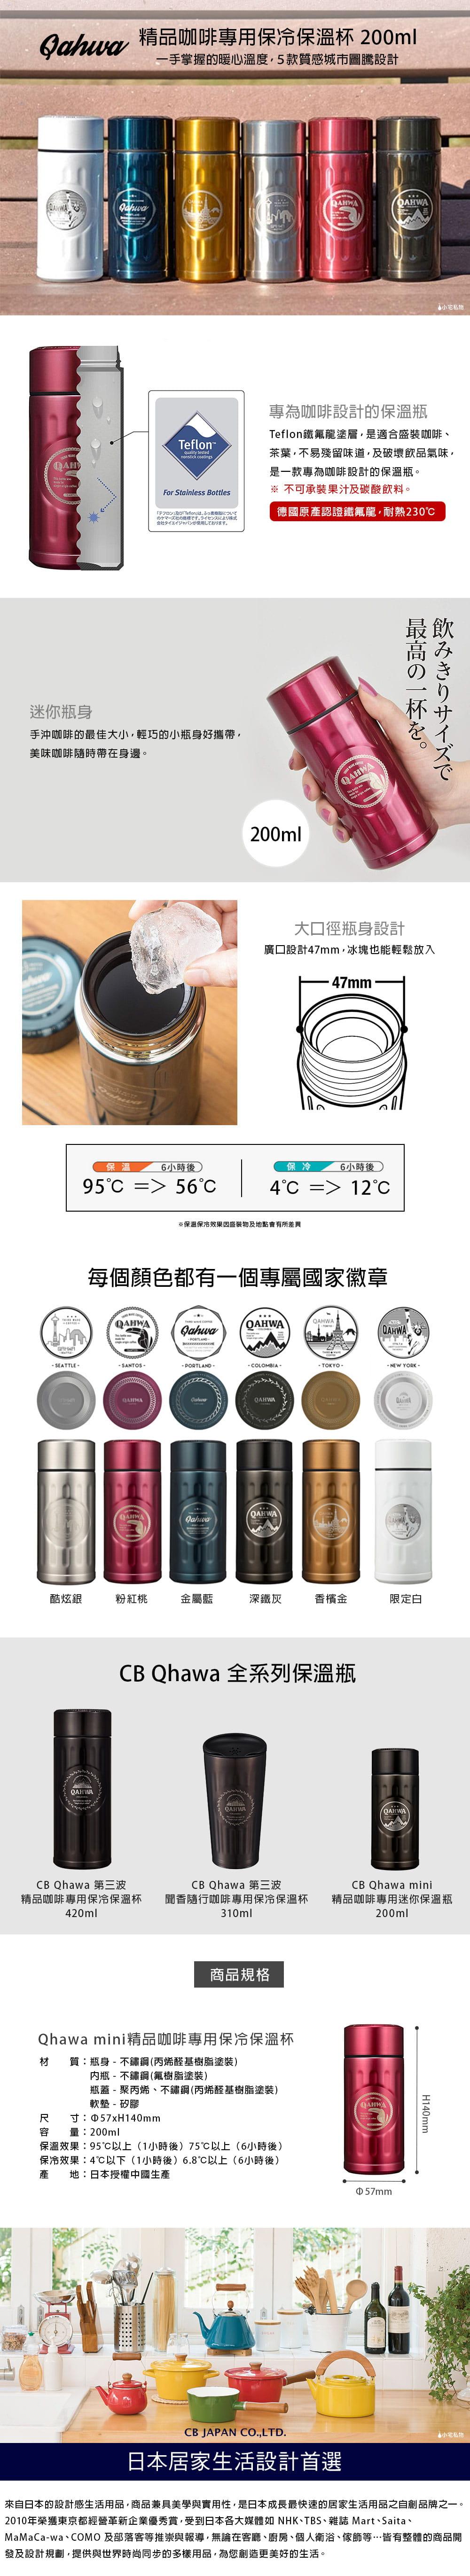 CB Japan Qahwa mini 精品咖啡專用保冷保溫杯 金屬藍